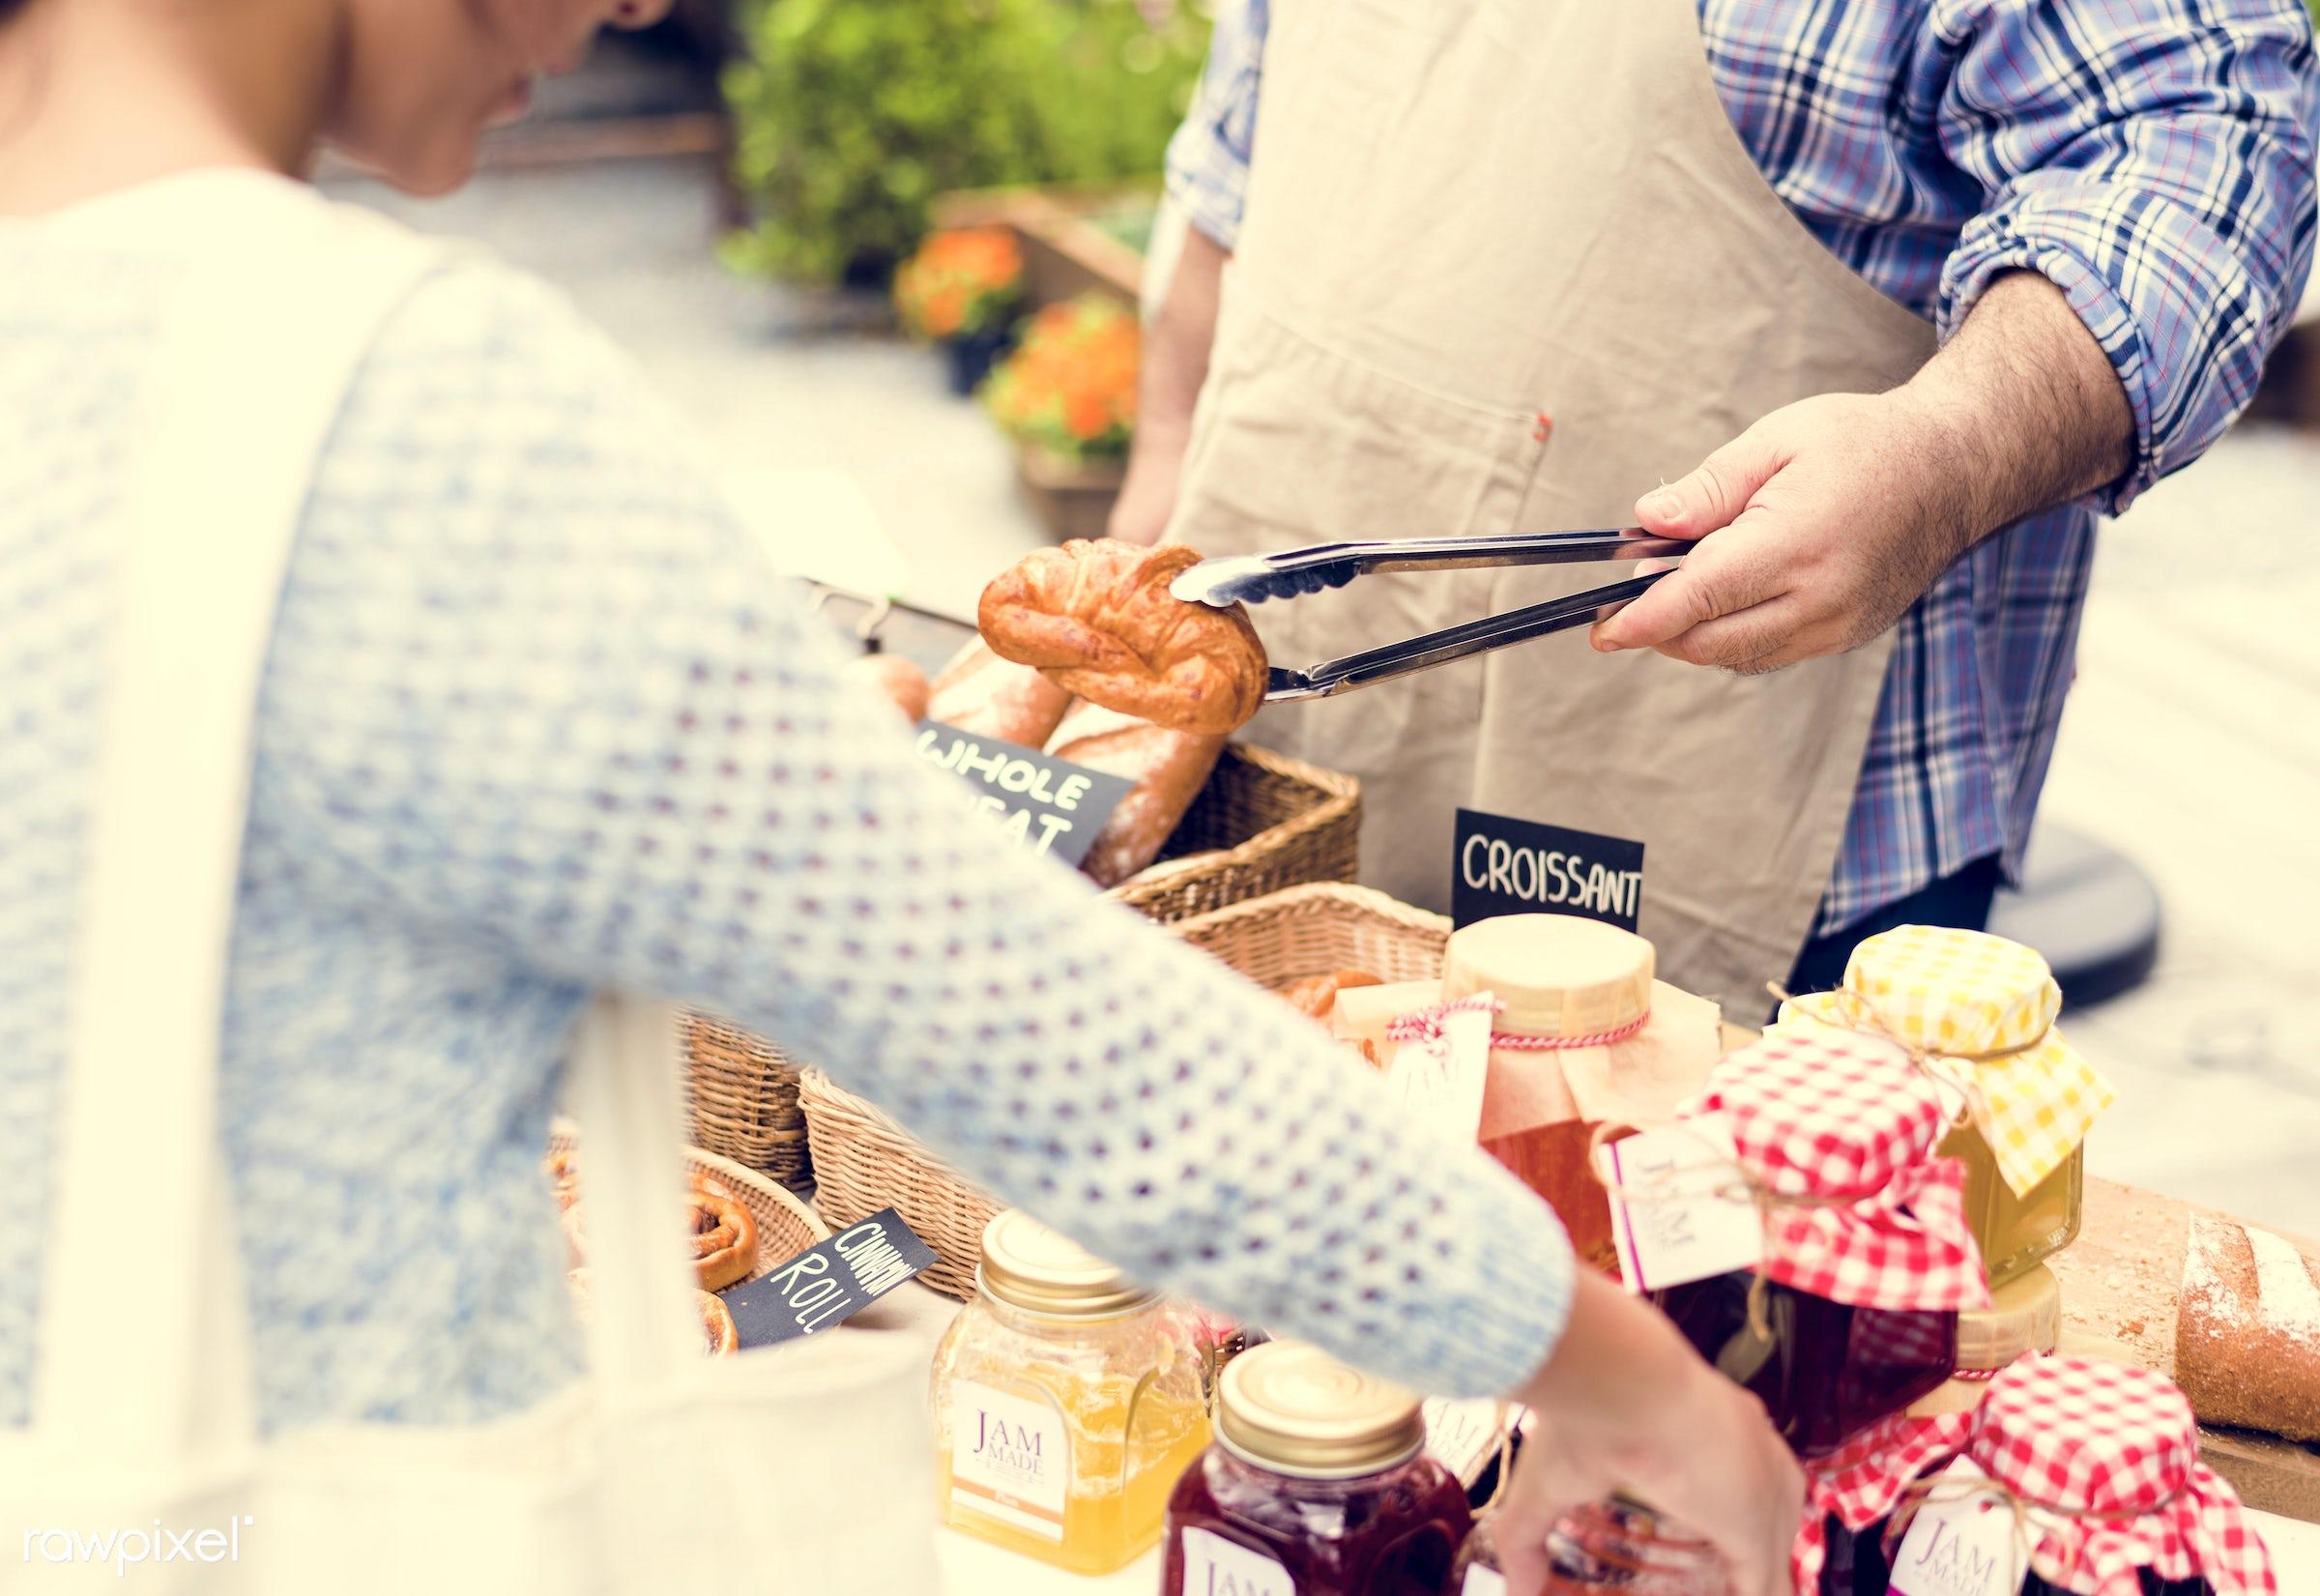 shop, stall, store, diverse, customer, people, woman, selling, season, fun, health, nutrition, market, food, shopping,...